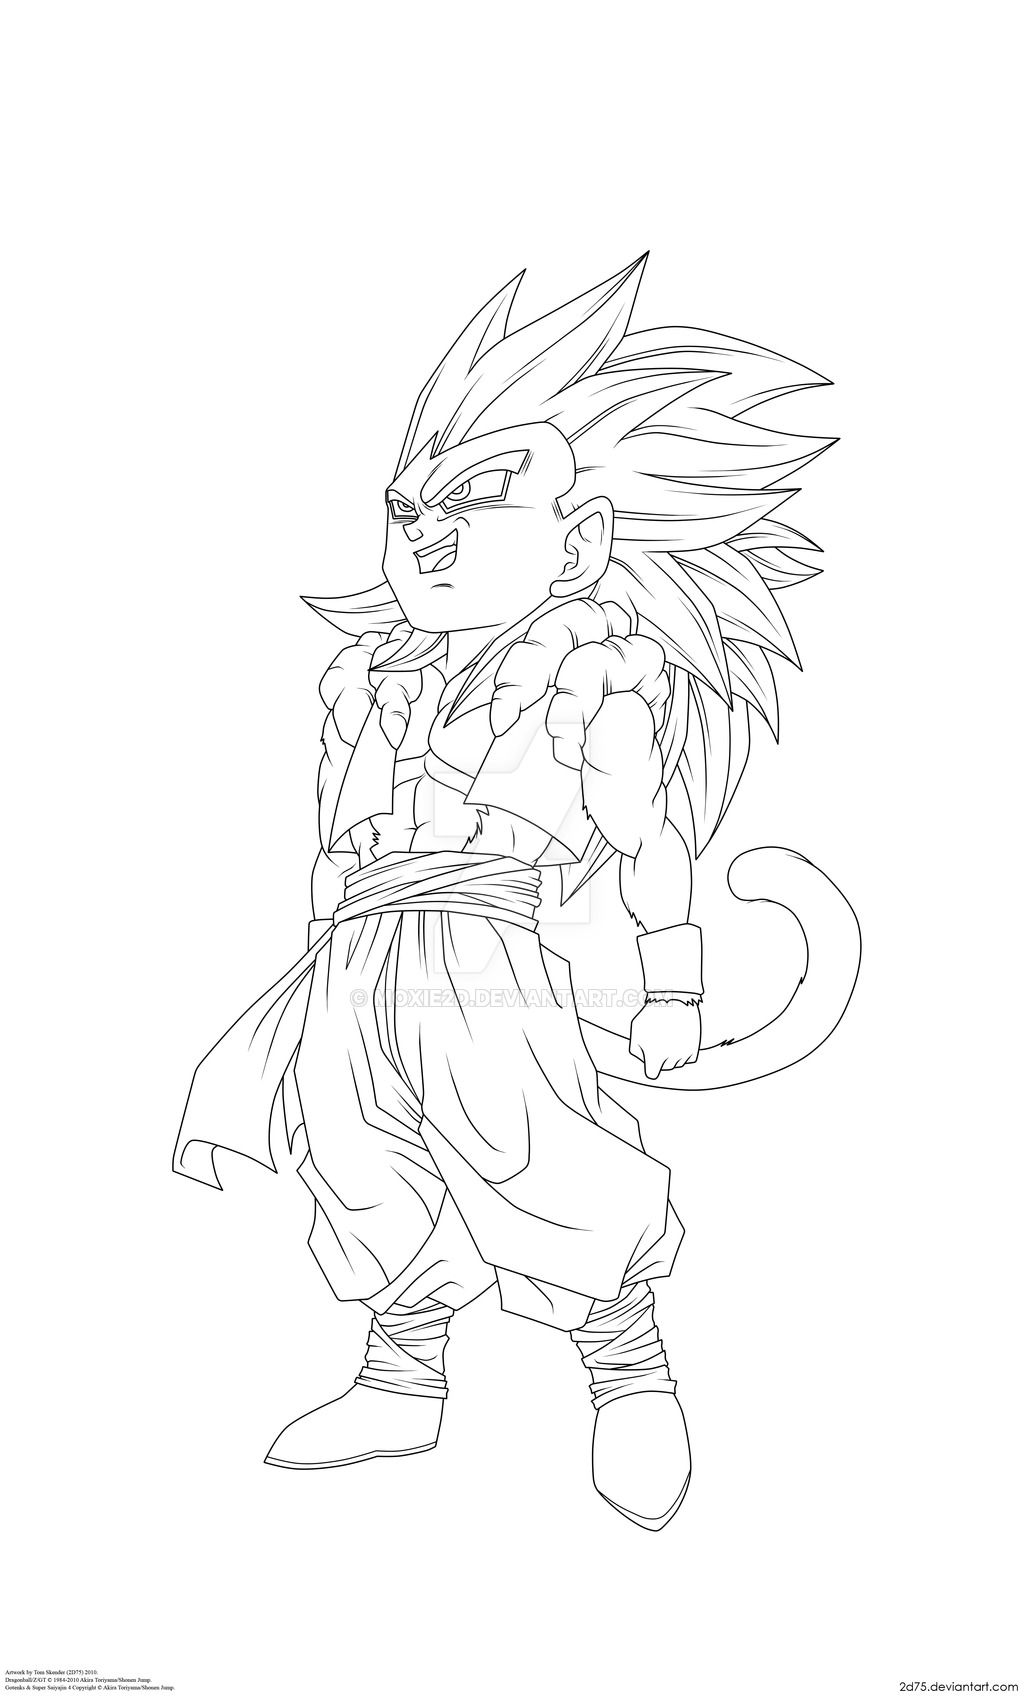 Vegito Ssj4 Coloring Pages Dragon Ball Artwork Dragon Ball Art Dragon Ball Super Art